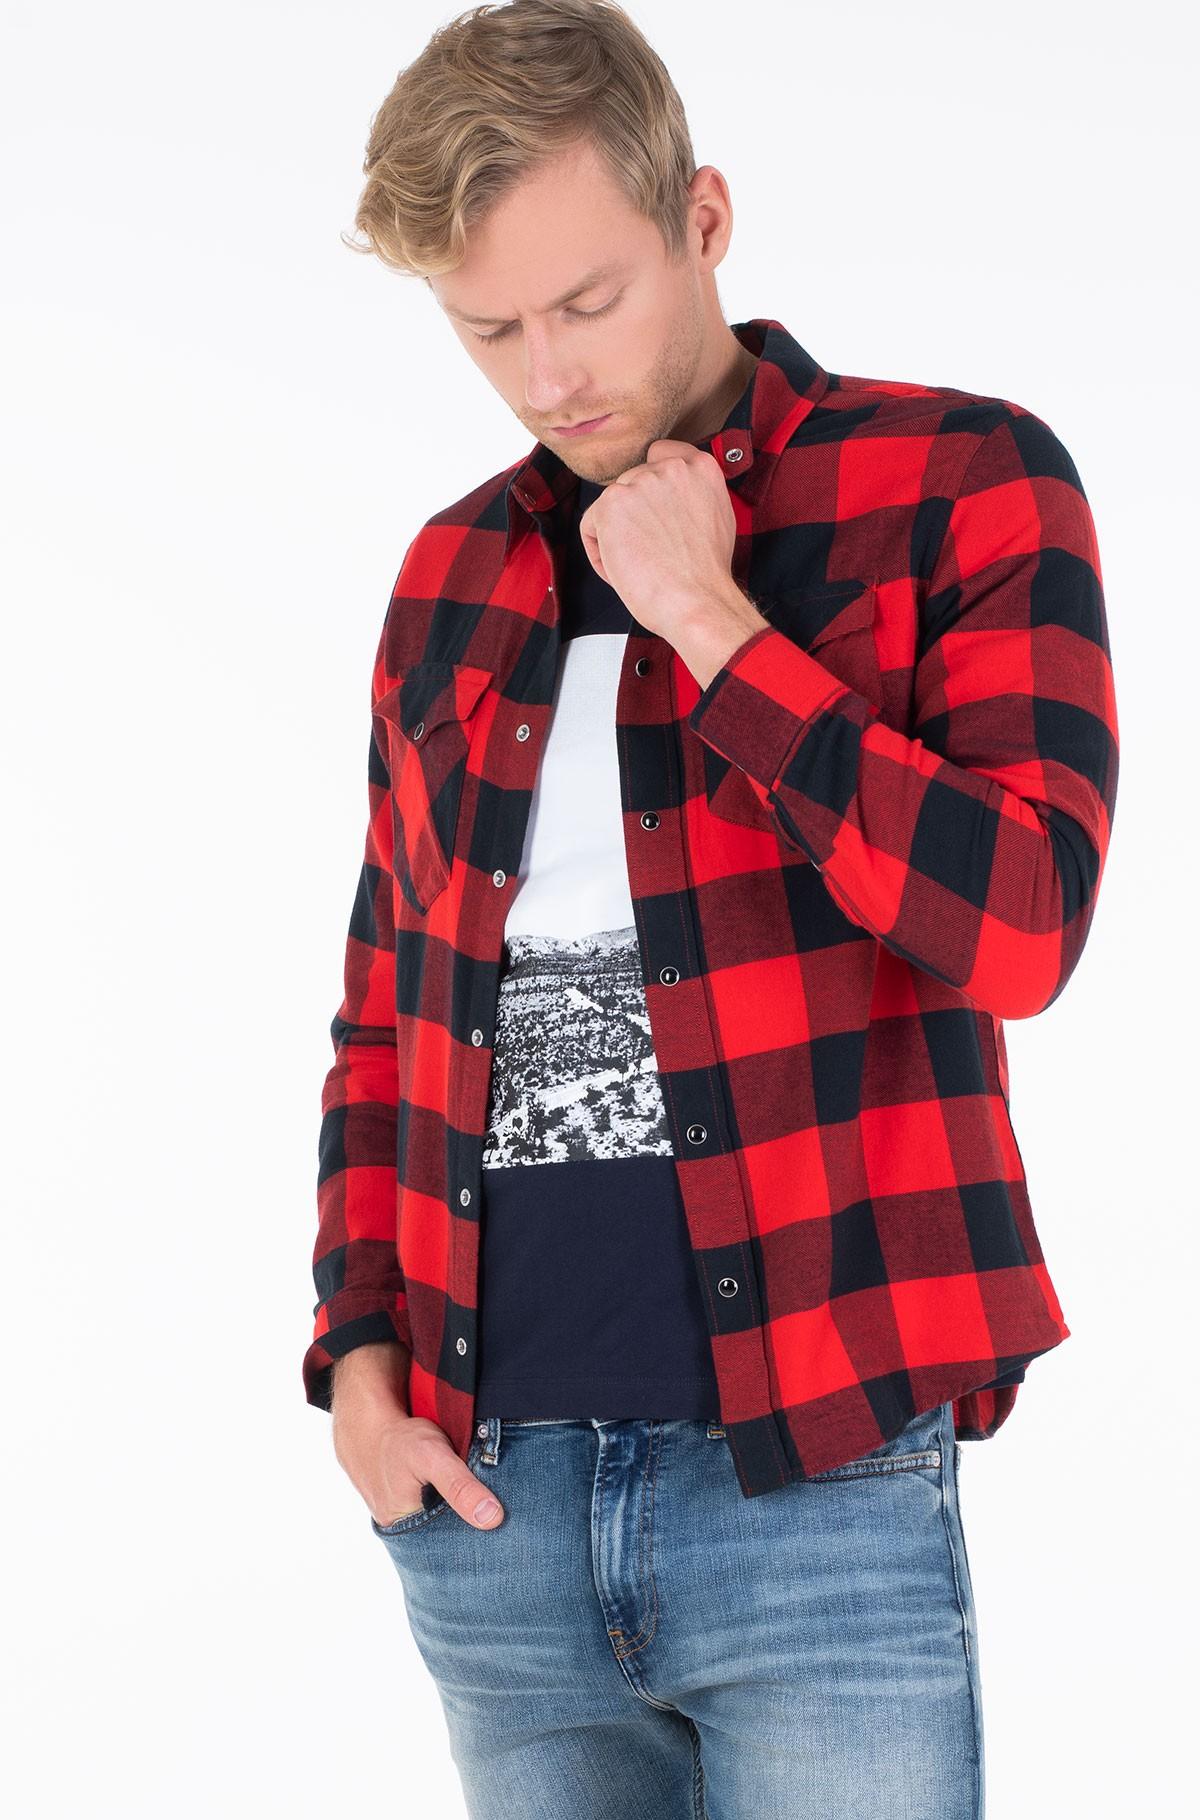 Shirt FLANNEL WESTERN CHECK REG SHIRT-full-1